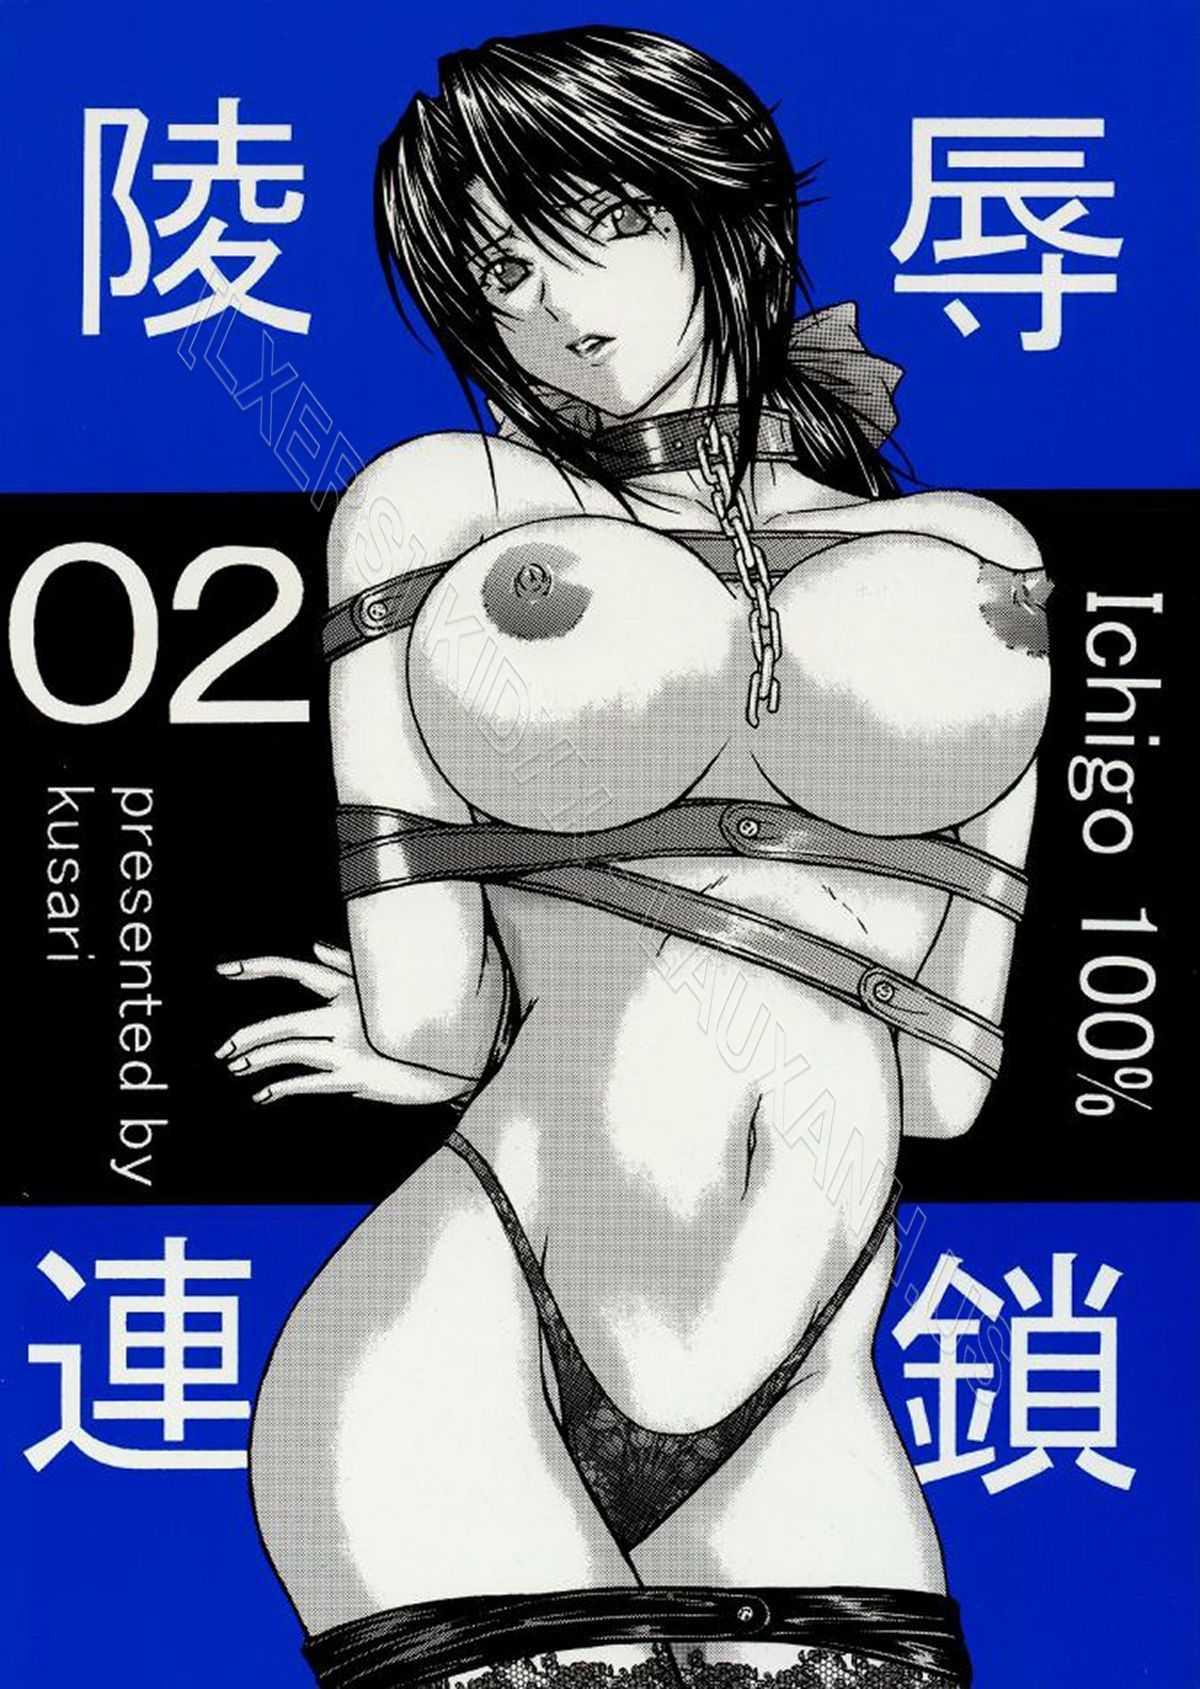 TruyenHay.Com - Ảnh 1 - Ryoujoku Rensa Chapter 2